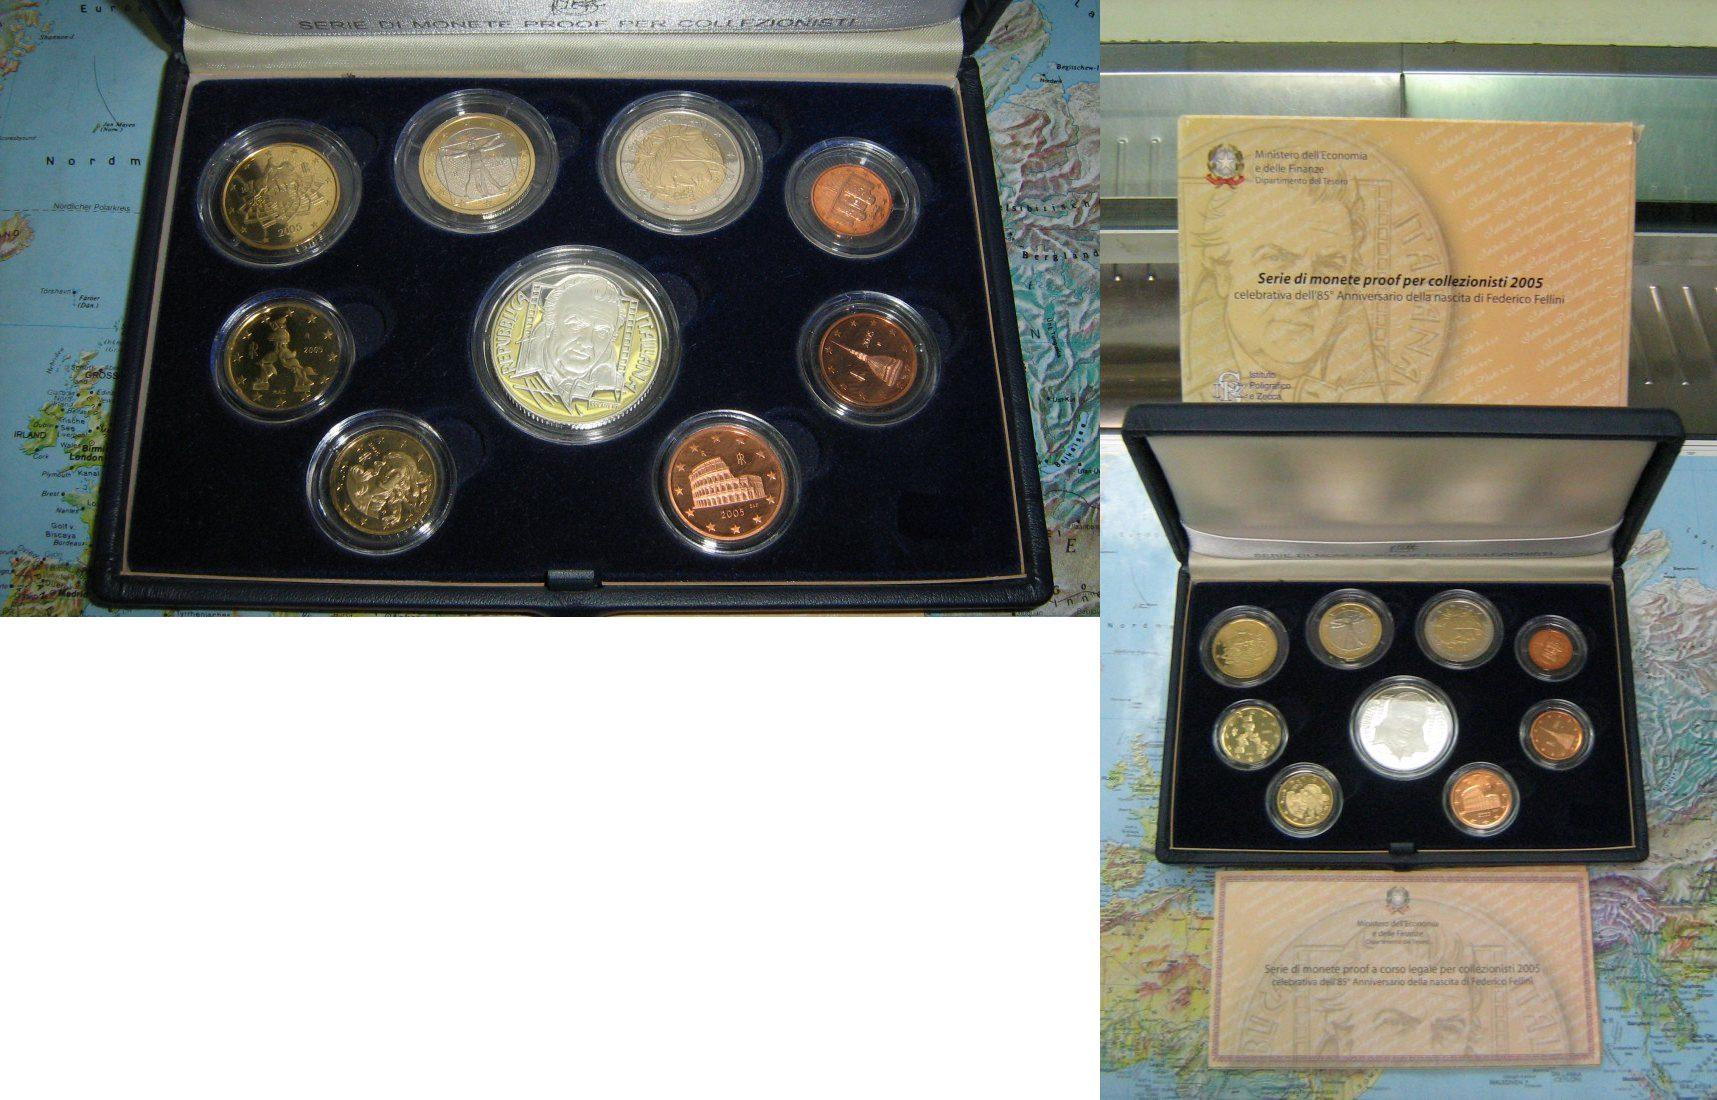 Euro Kursmünzensatz 2005 Italien Italien KMS Kursmünzensatz 2005 Polierte Platte mit Silber Fellini Bankfr. Proof Originalverp.